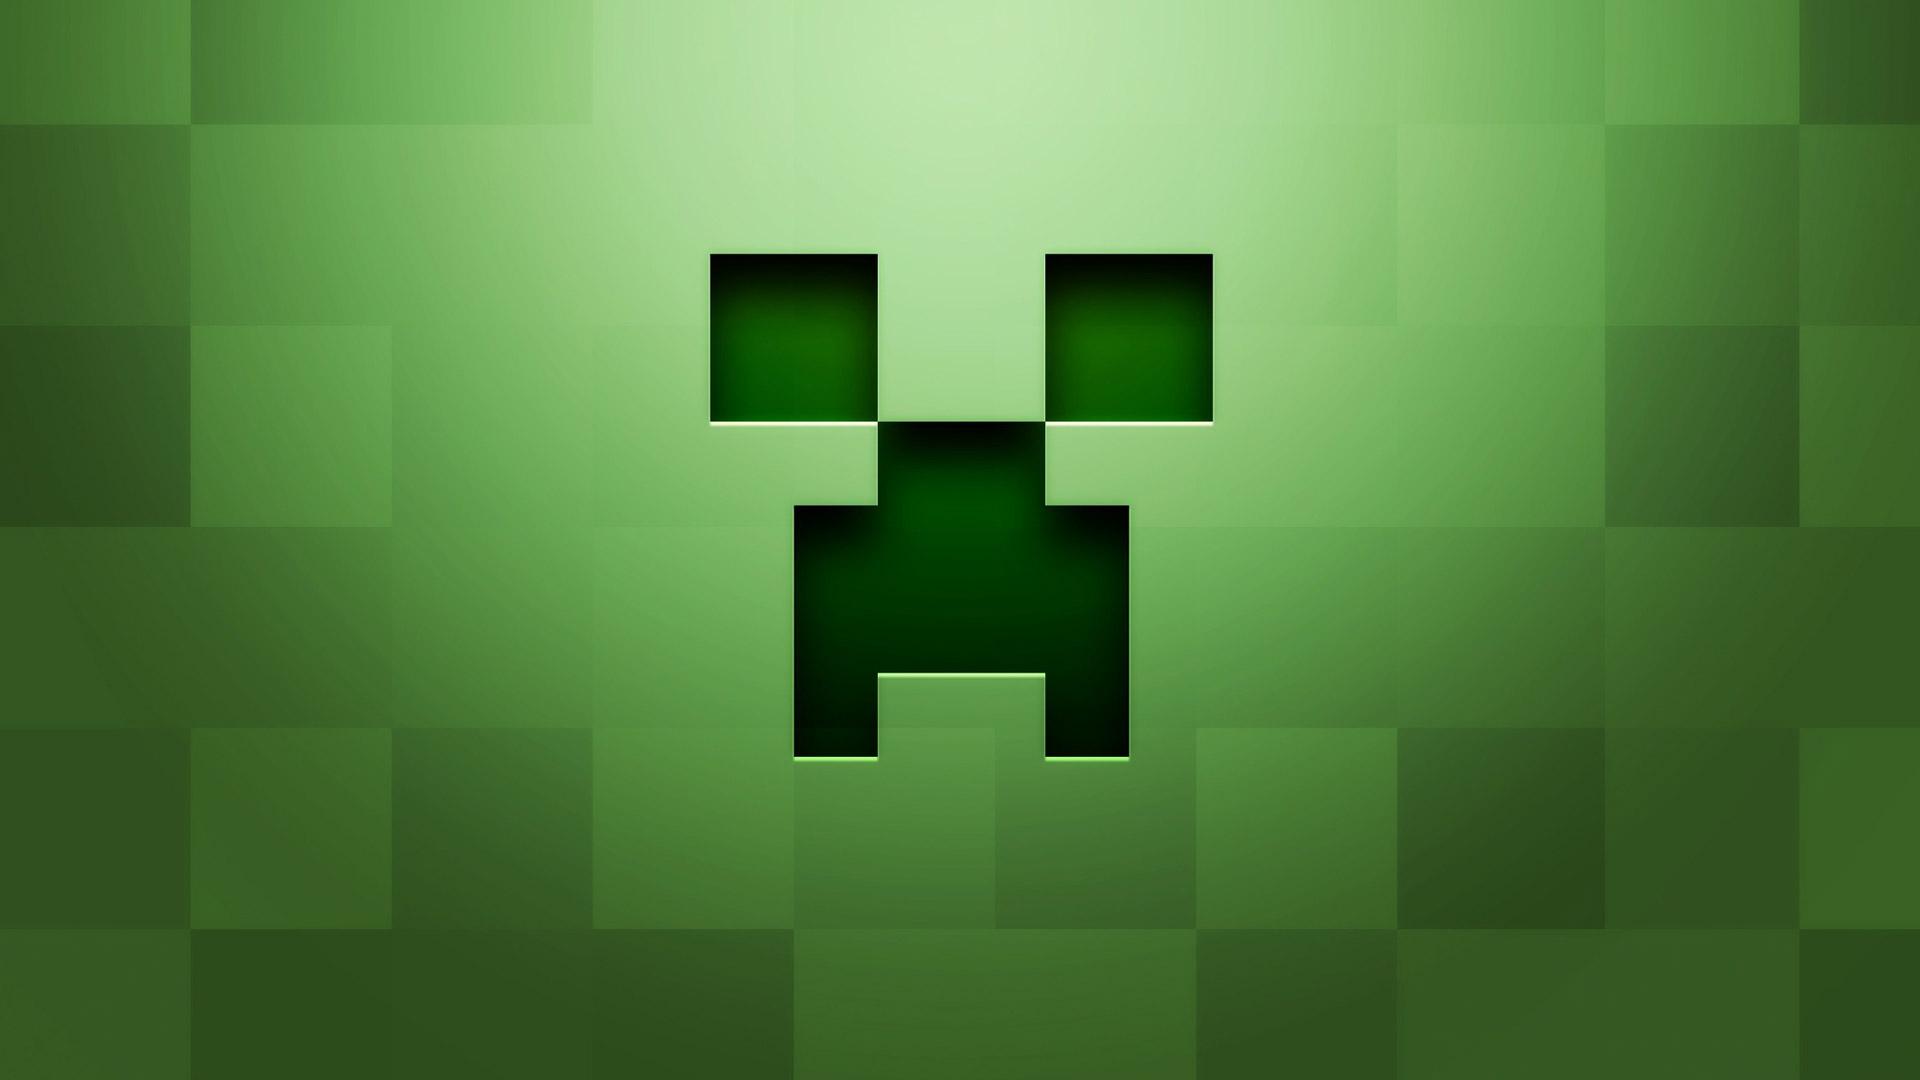 Minecraft wallpaper 7